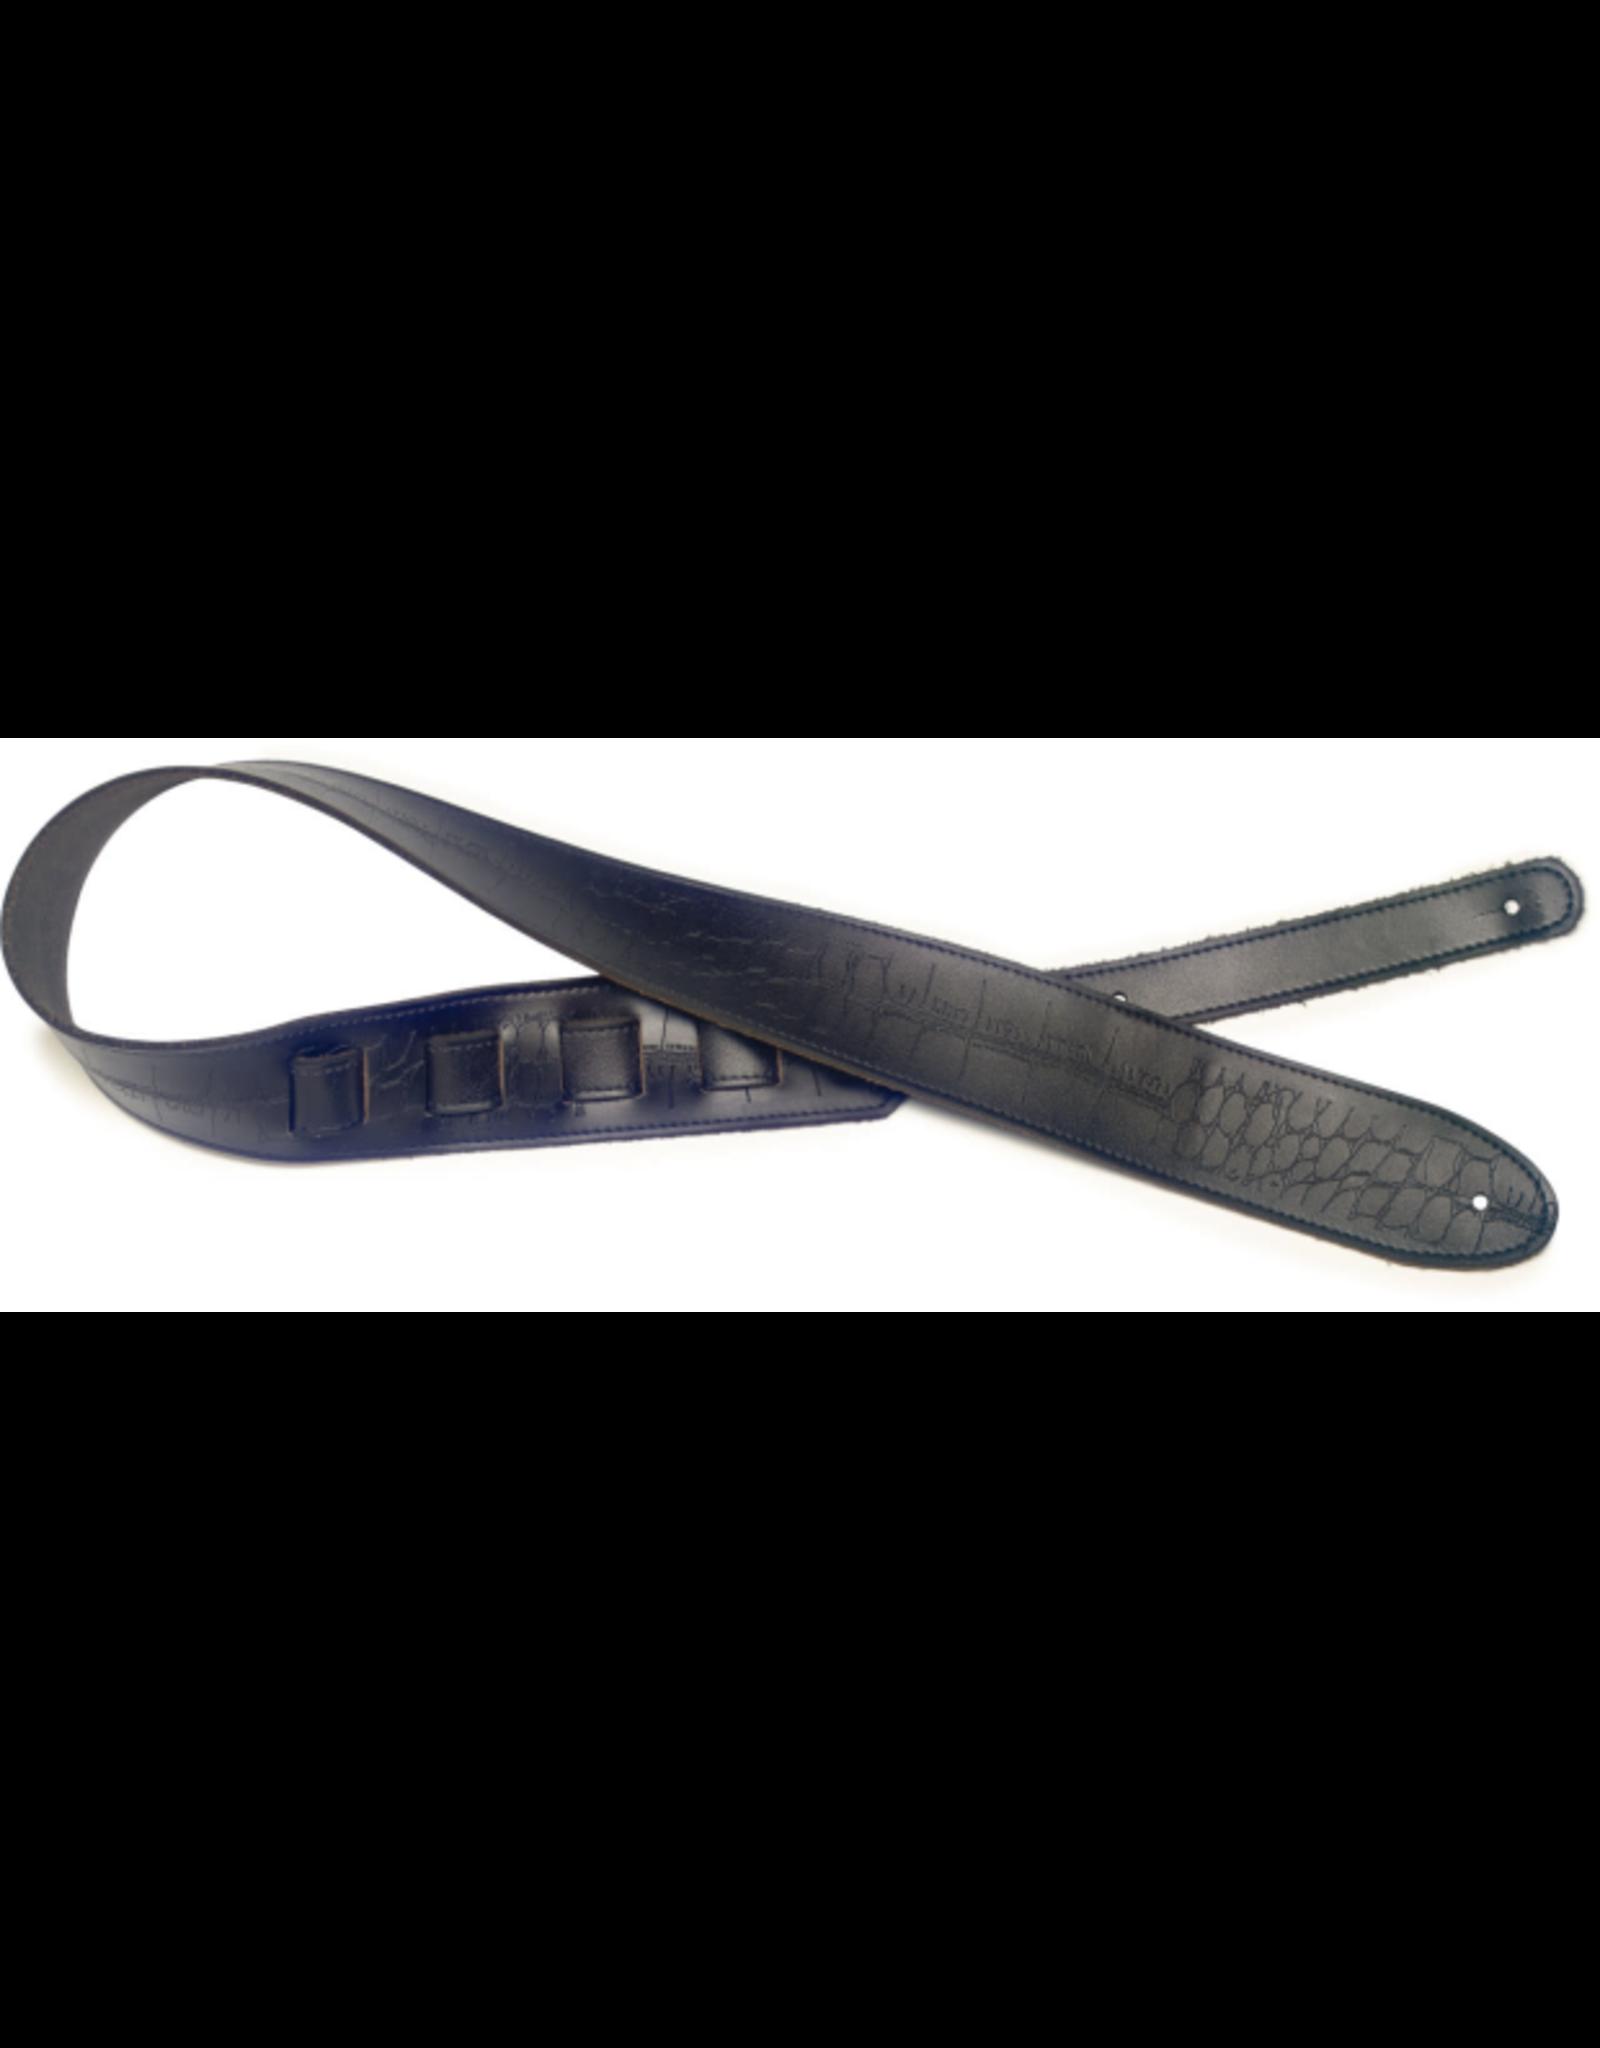 Stagg Stagg Black Leather Guitar Strap w/Pressed Crocodile Pattern Black